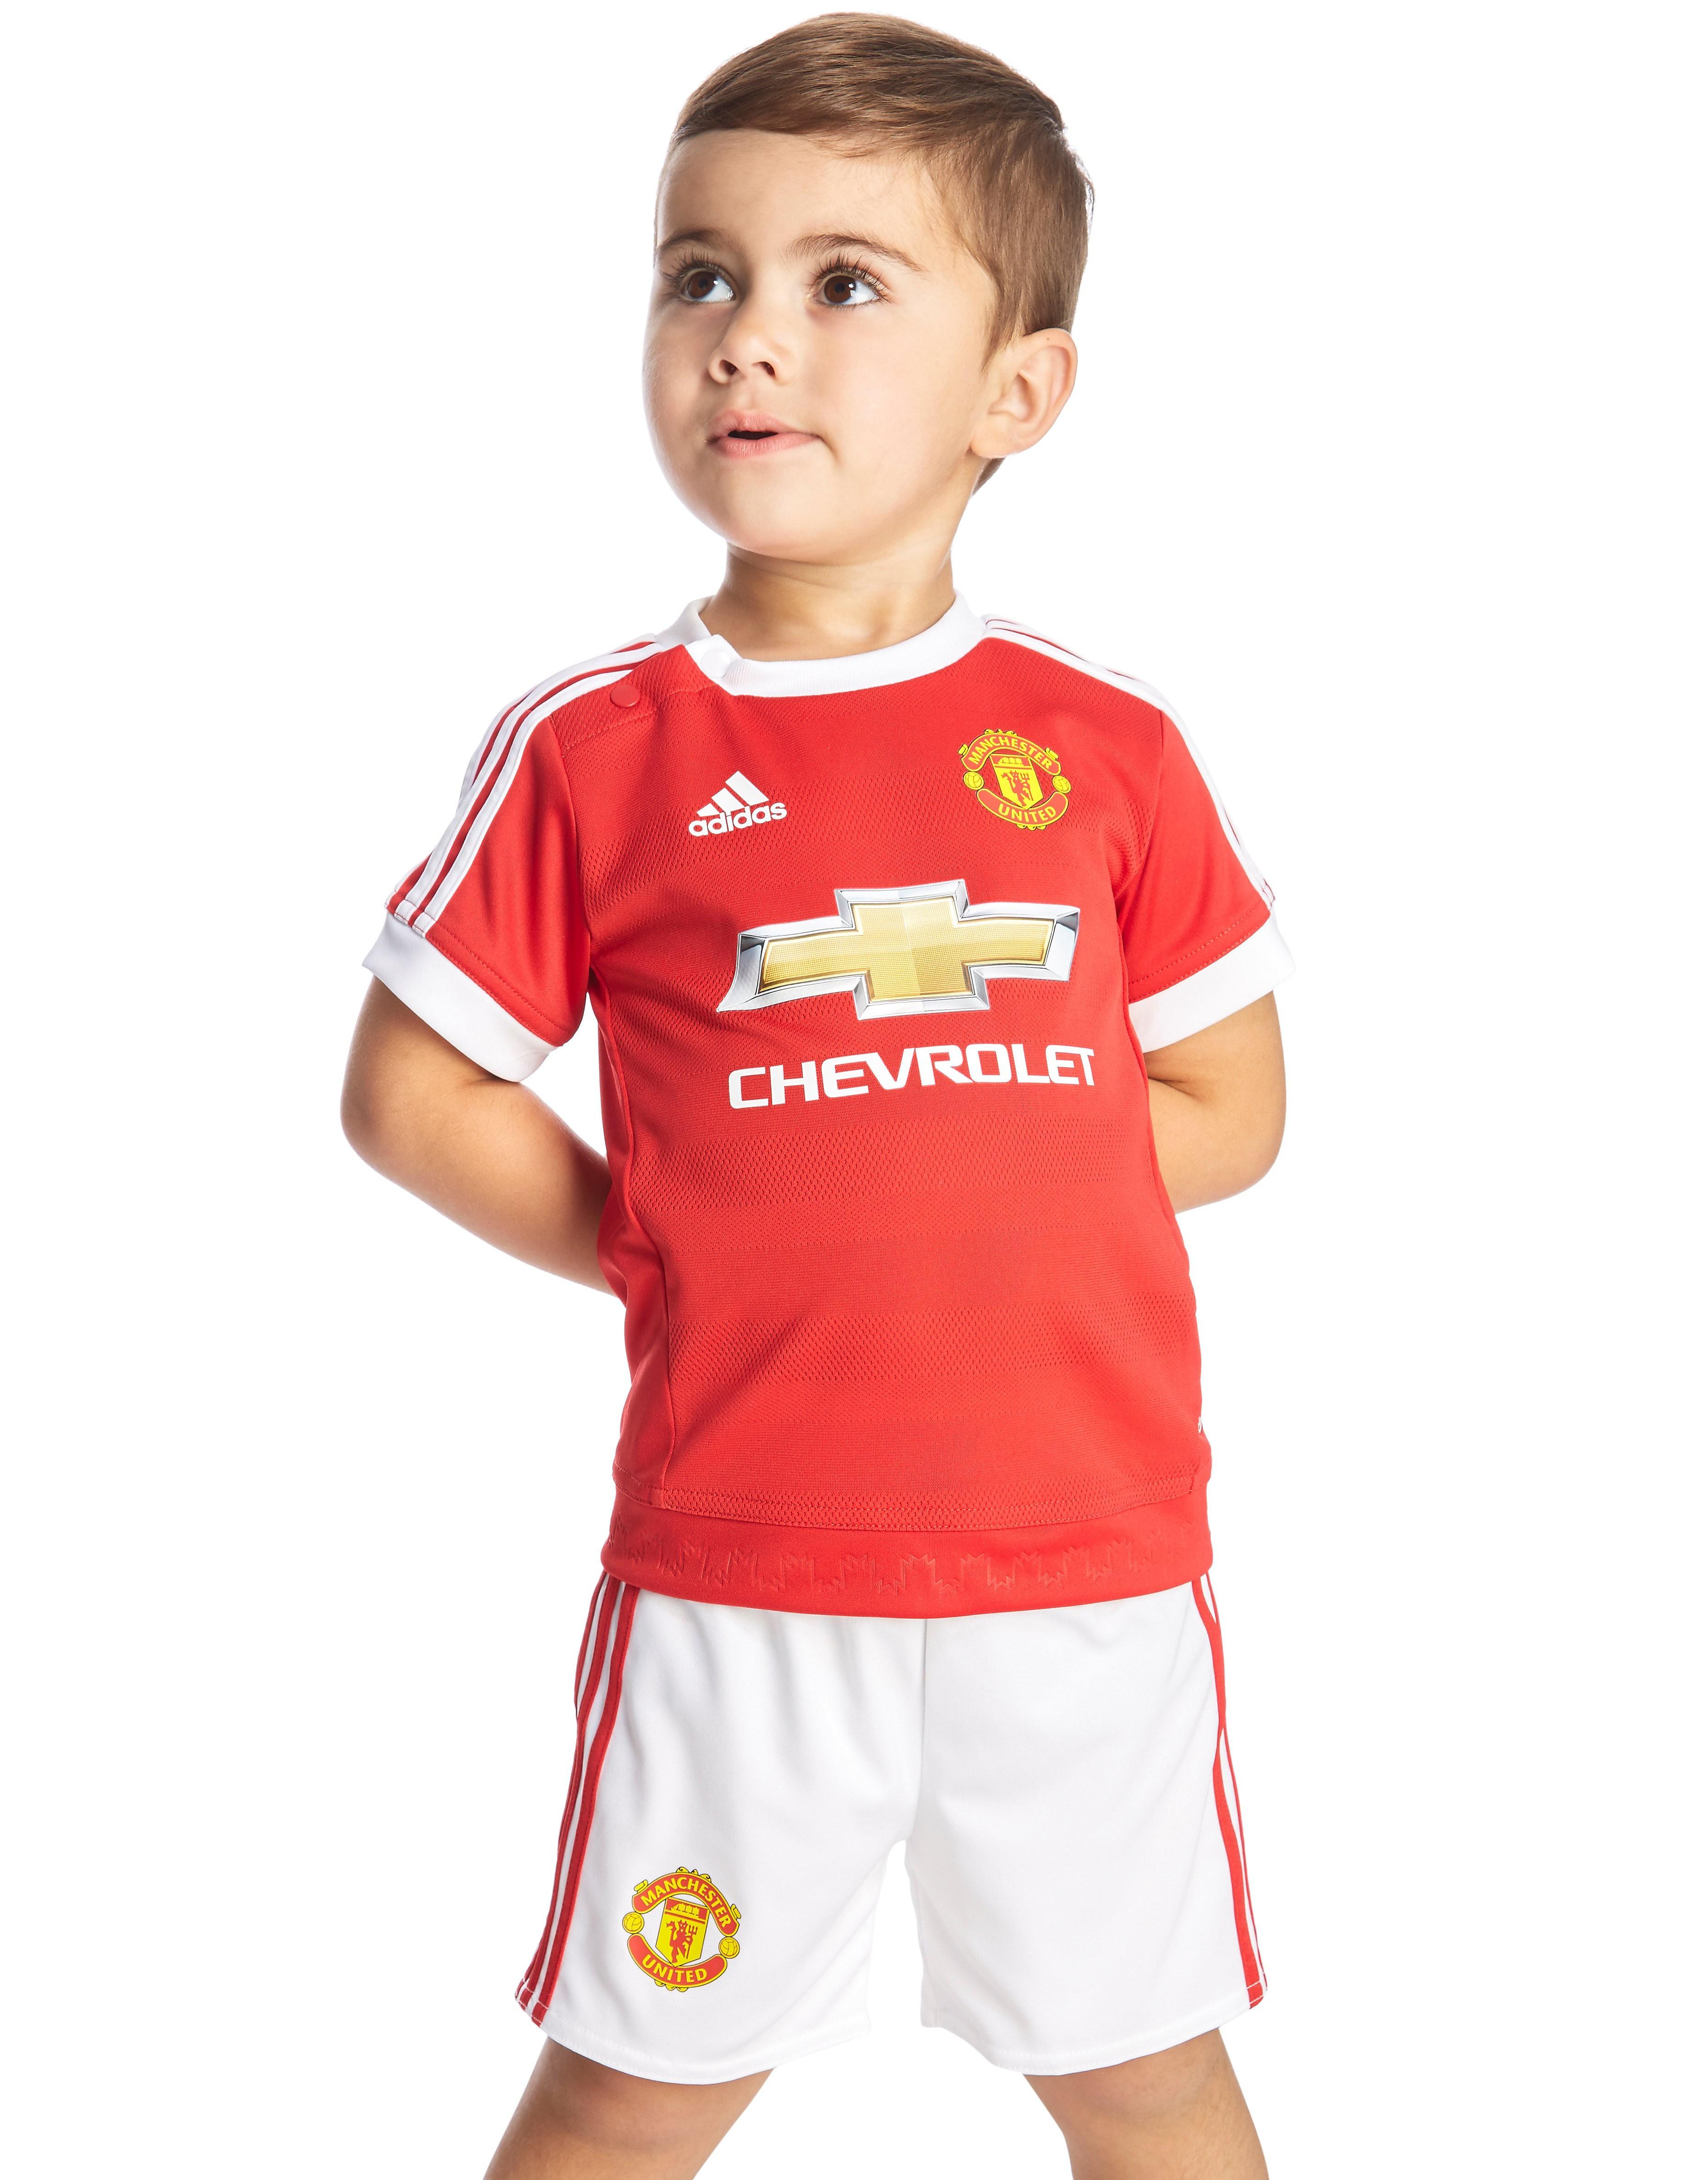 adidas Manchester United 2015 Home Kit Infant